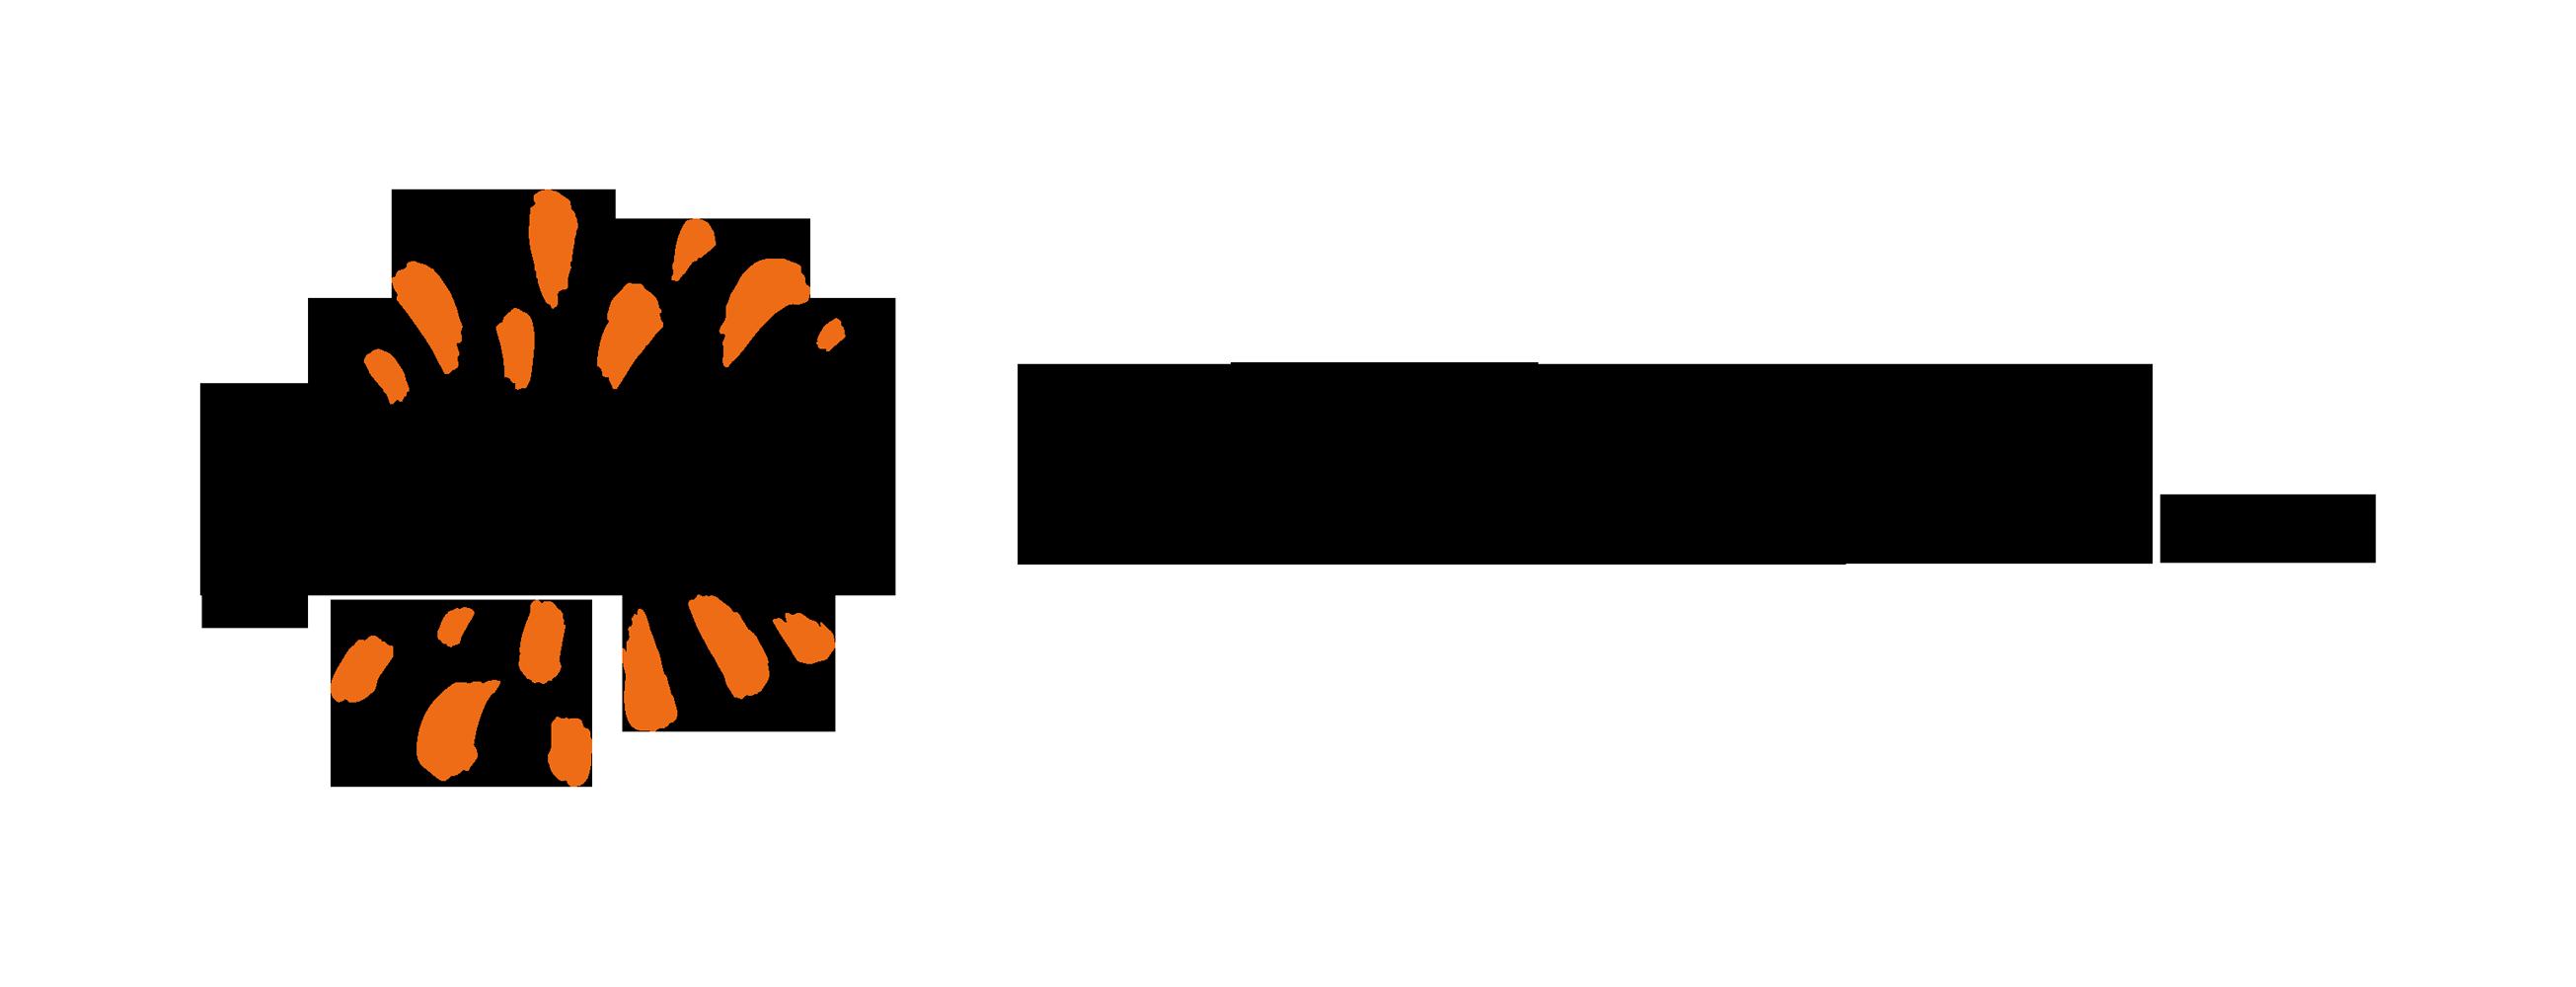 Humak, Humanistisen ammattirkorkeakoulun logo